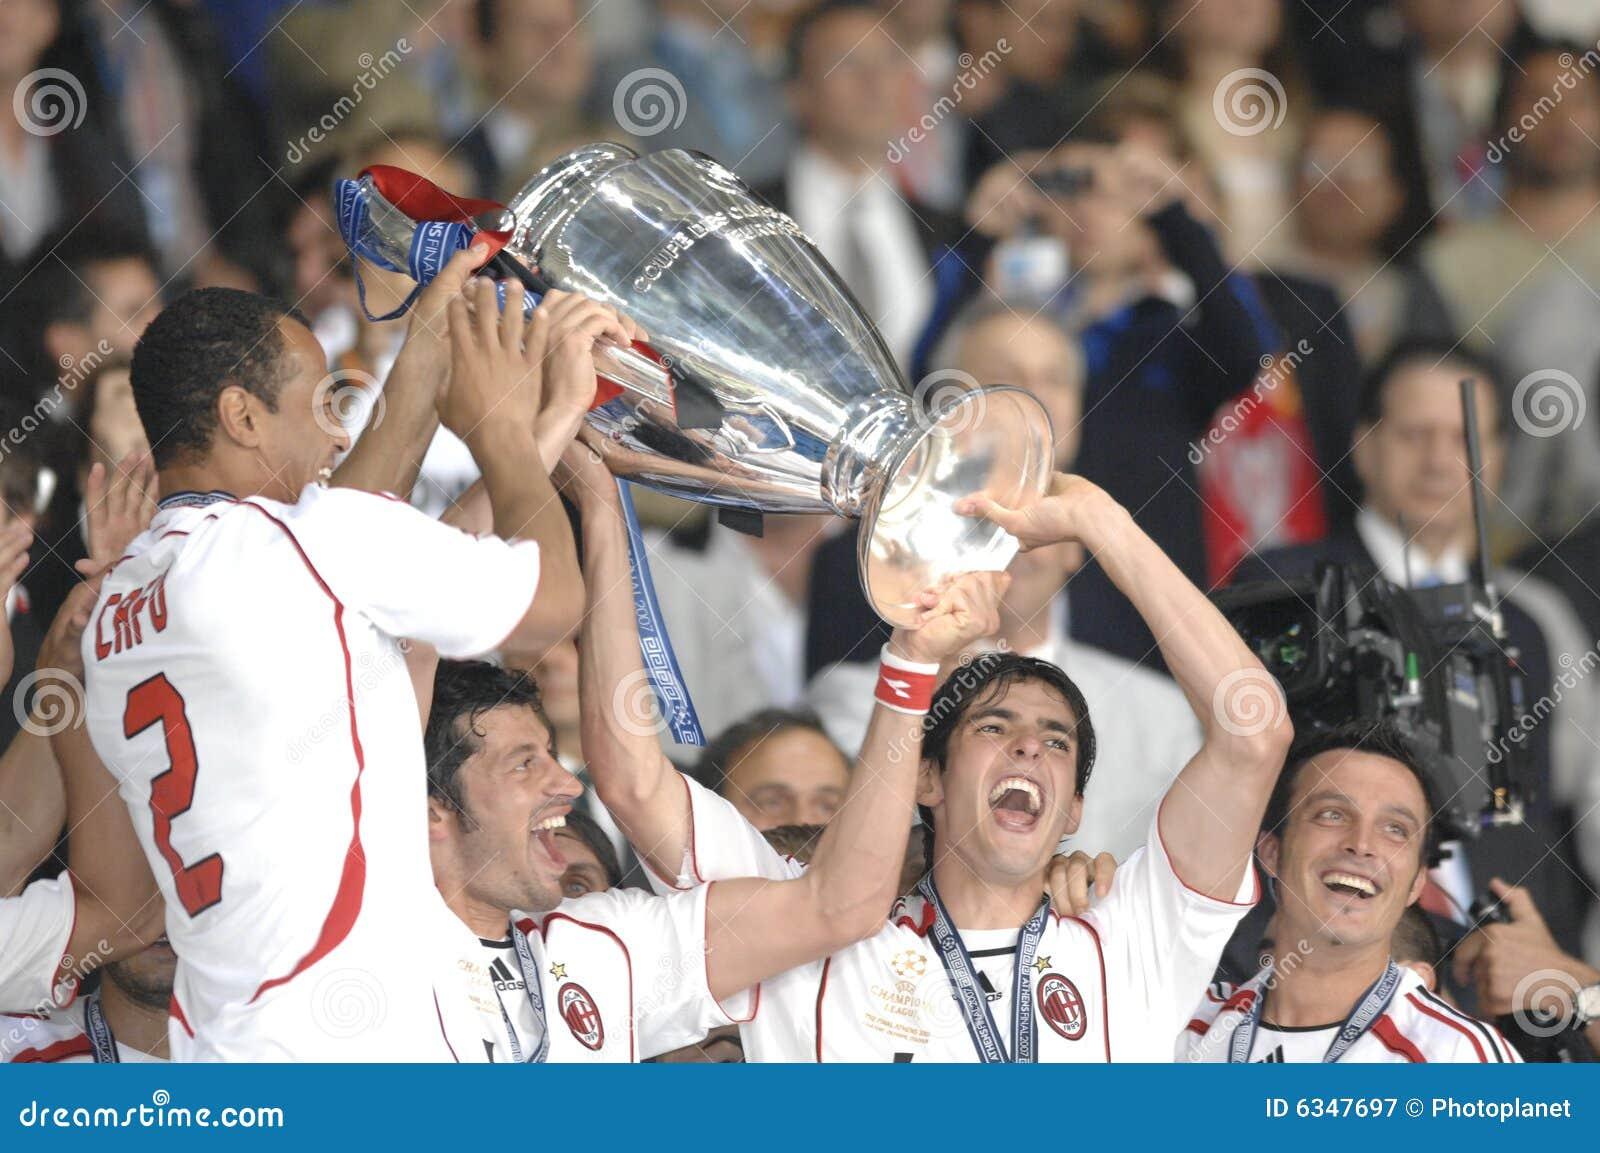 milan uefa champions league 2007 - photo#7